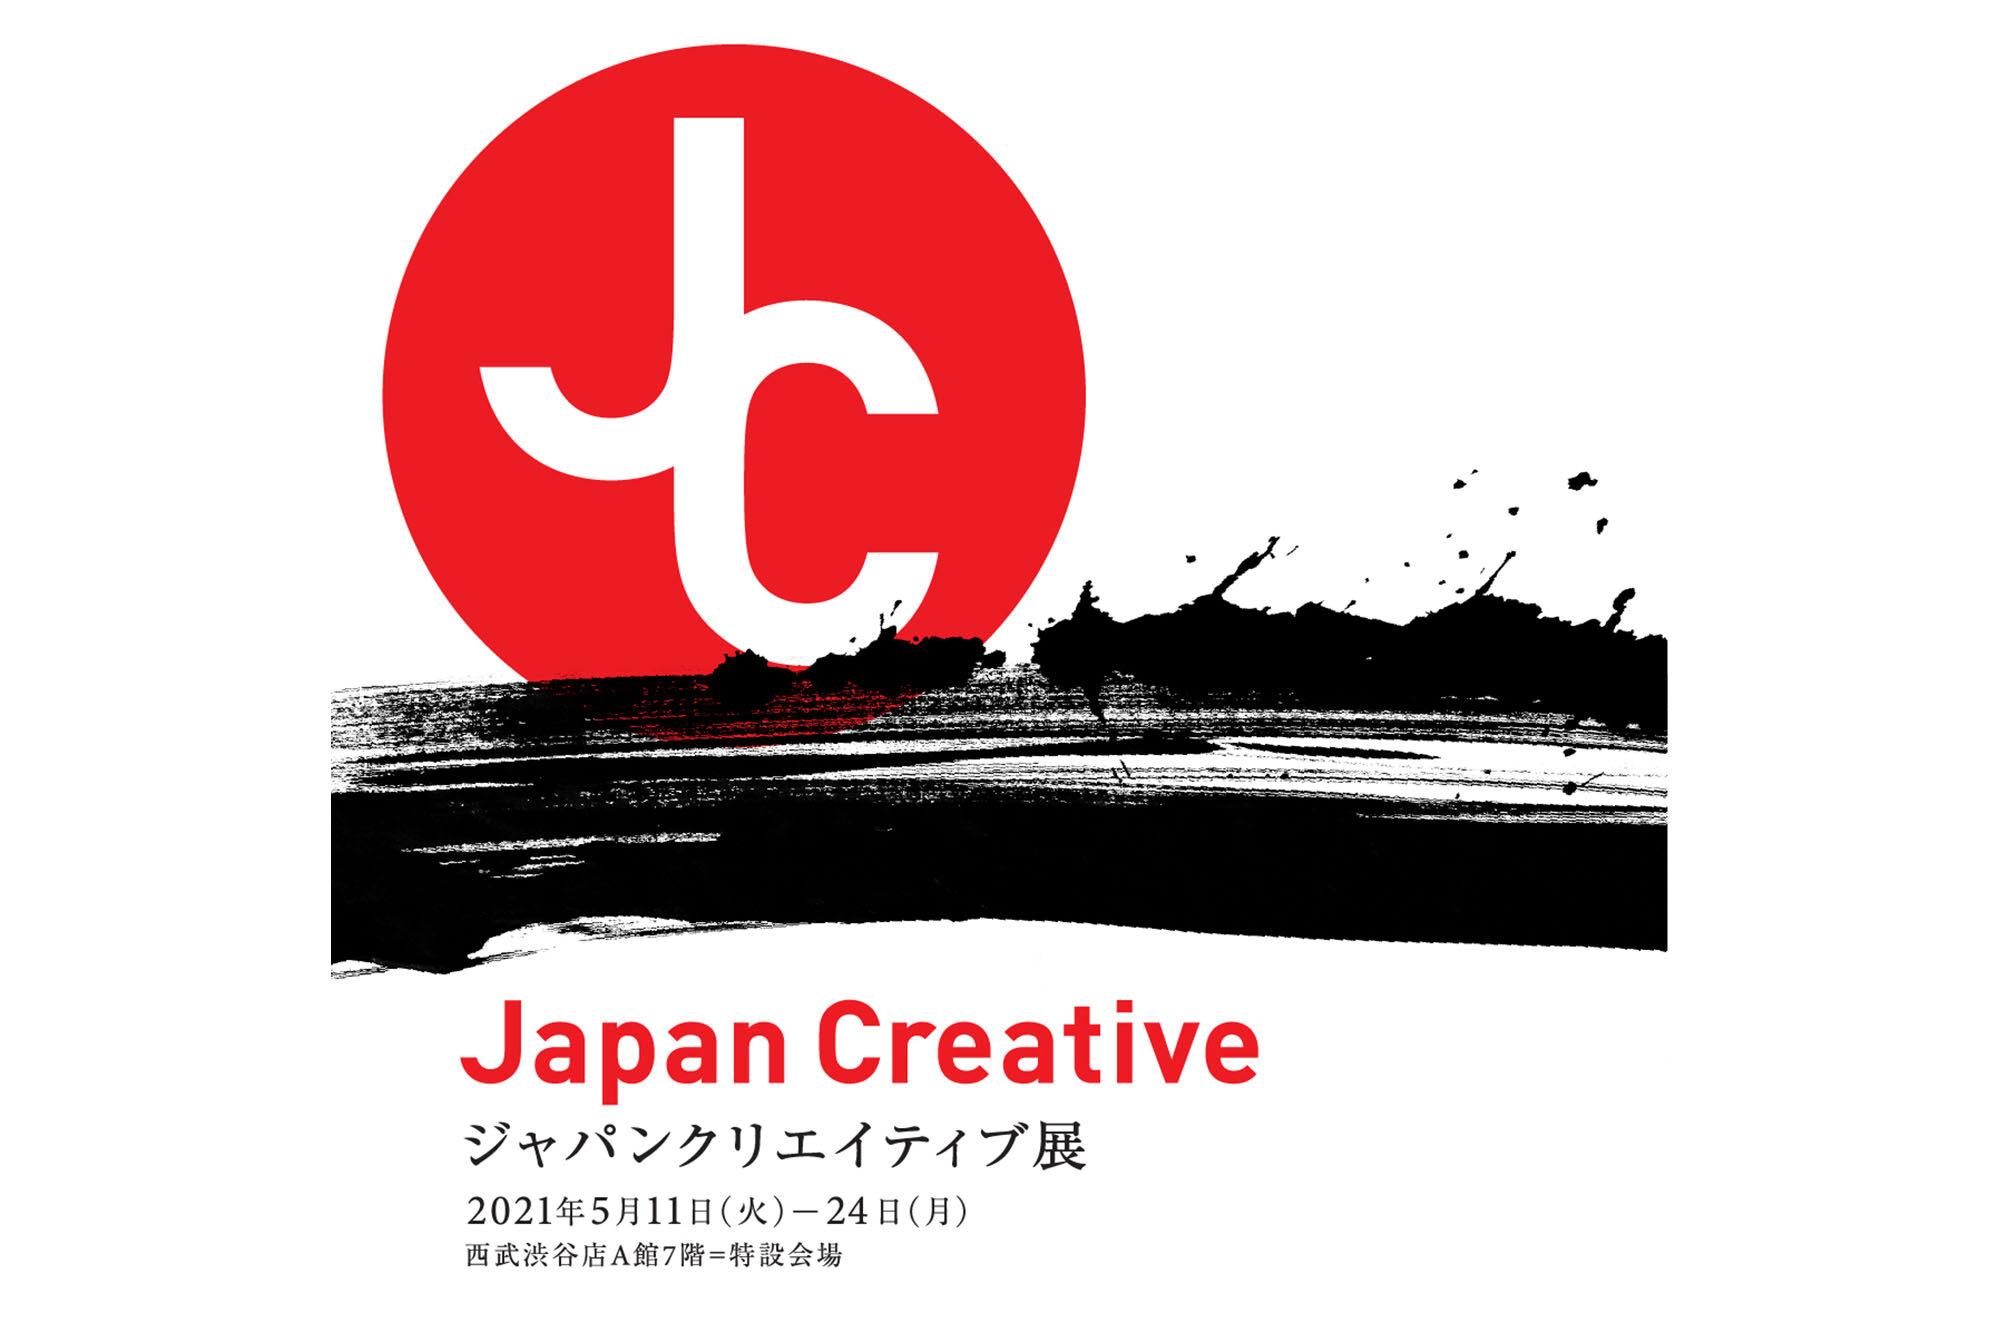 Japan Creative 2011-2021